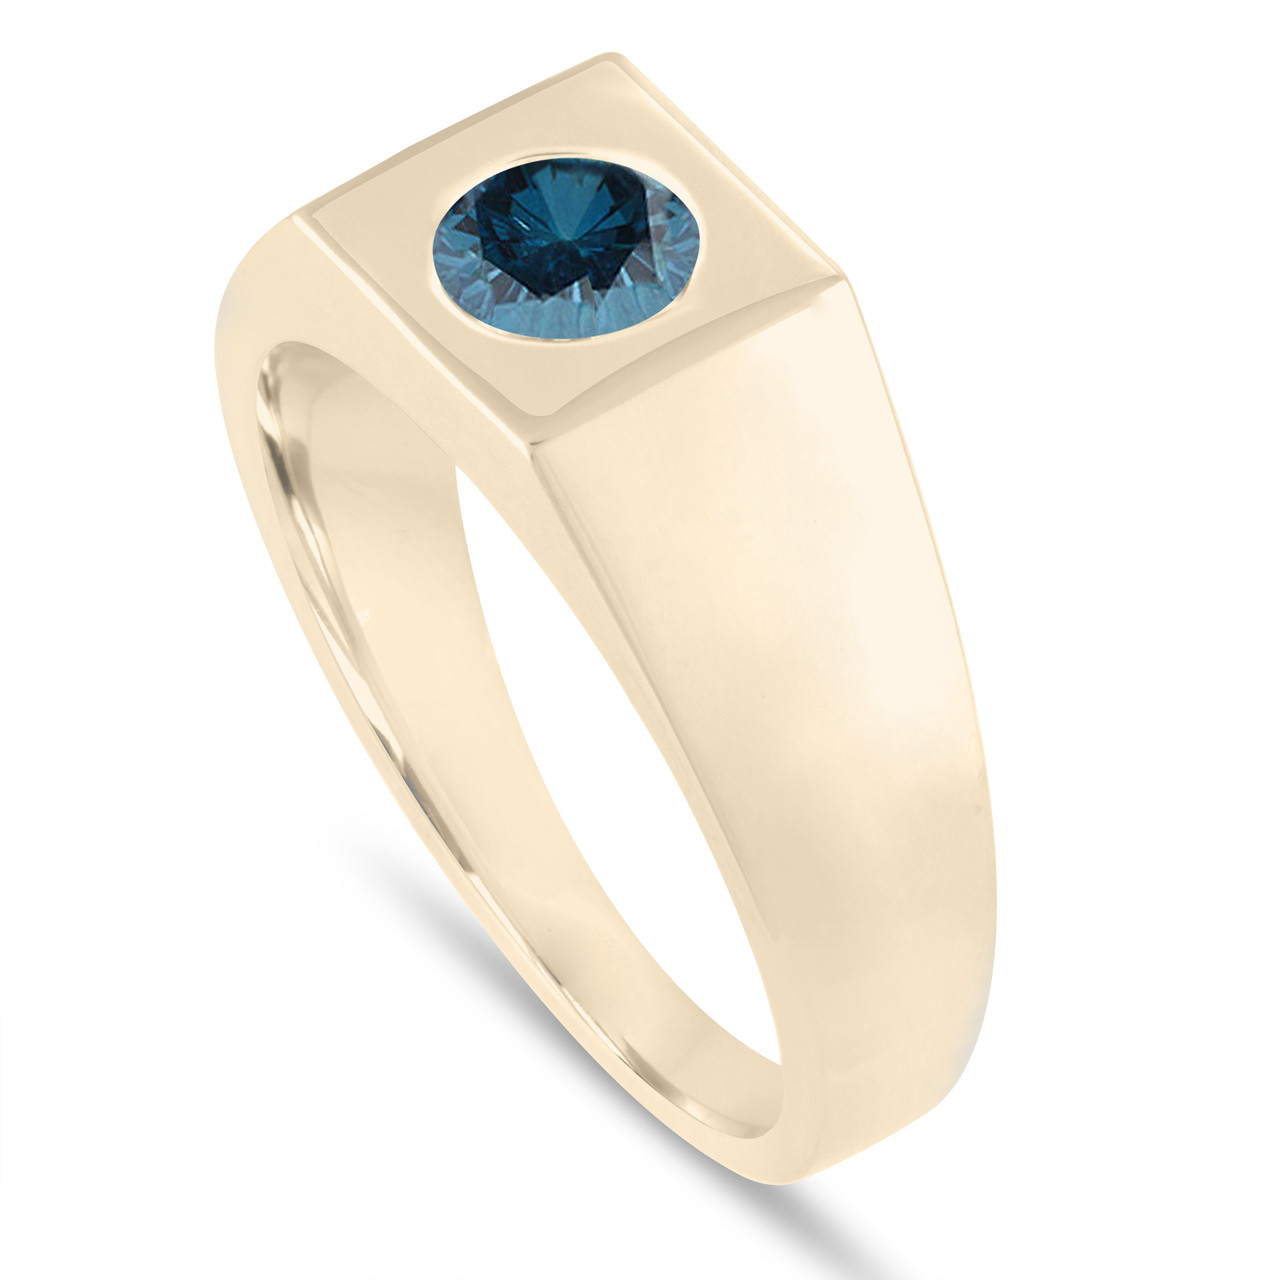 Wedding Ring For Men.0 90 Carat Men S Blue Diamond Solitaire Wedding Ring Mens Engagement Ring 14k Yellow Gold Handmade